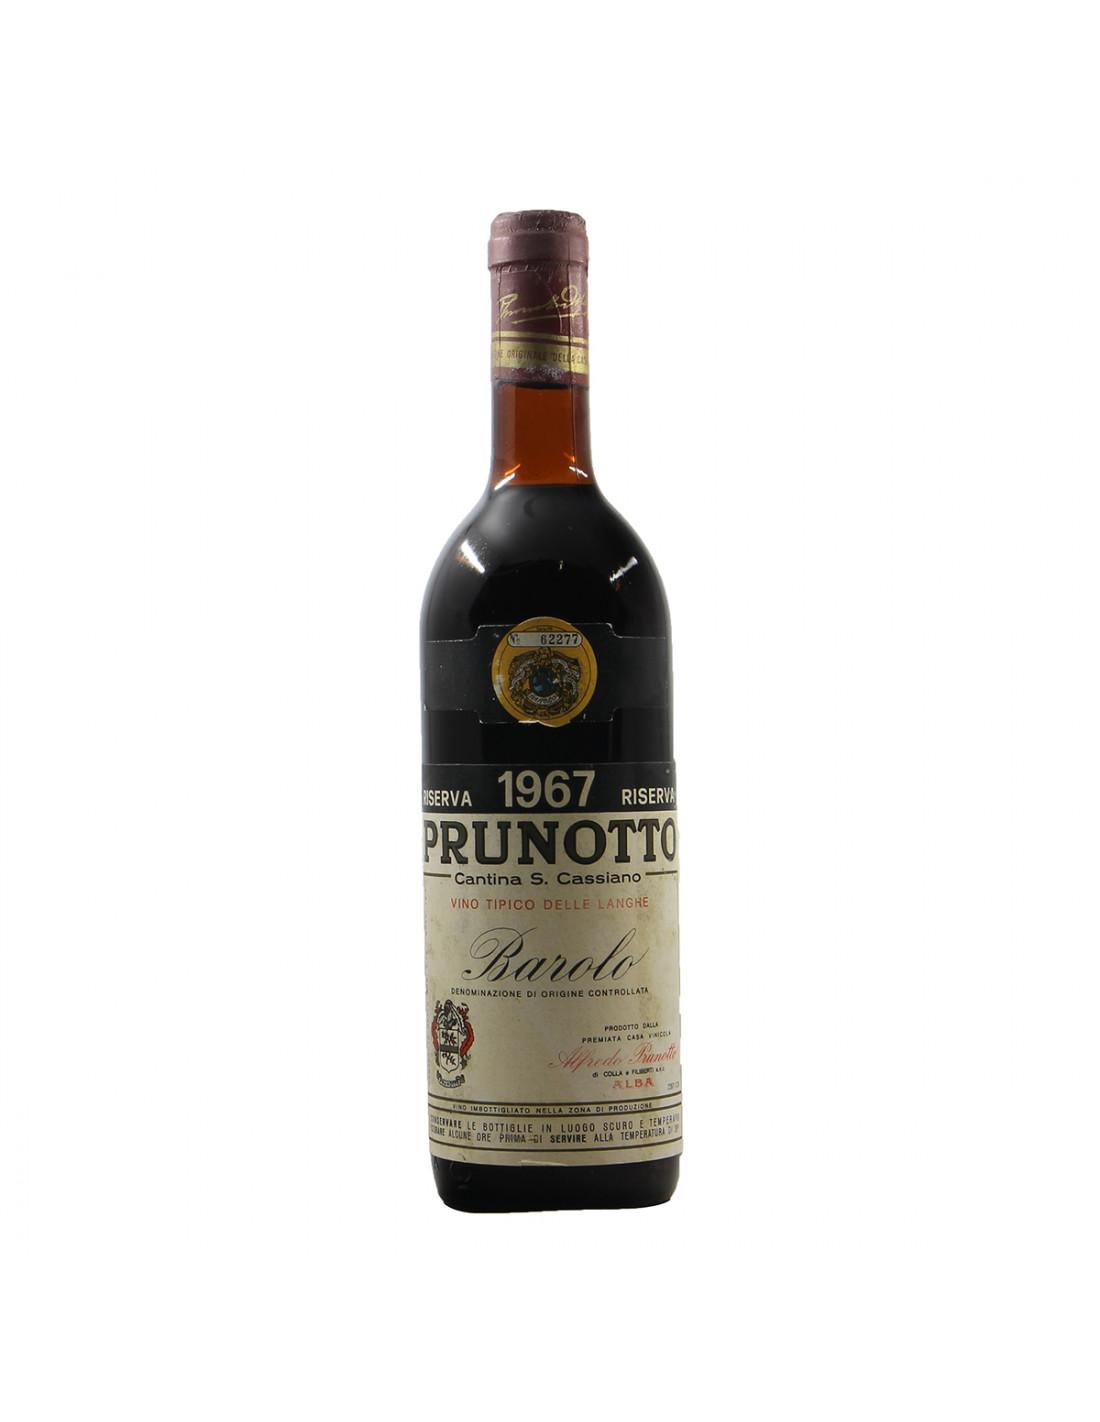 Prunotto Barolo Riserva 1967 Grandi Bottiglie